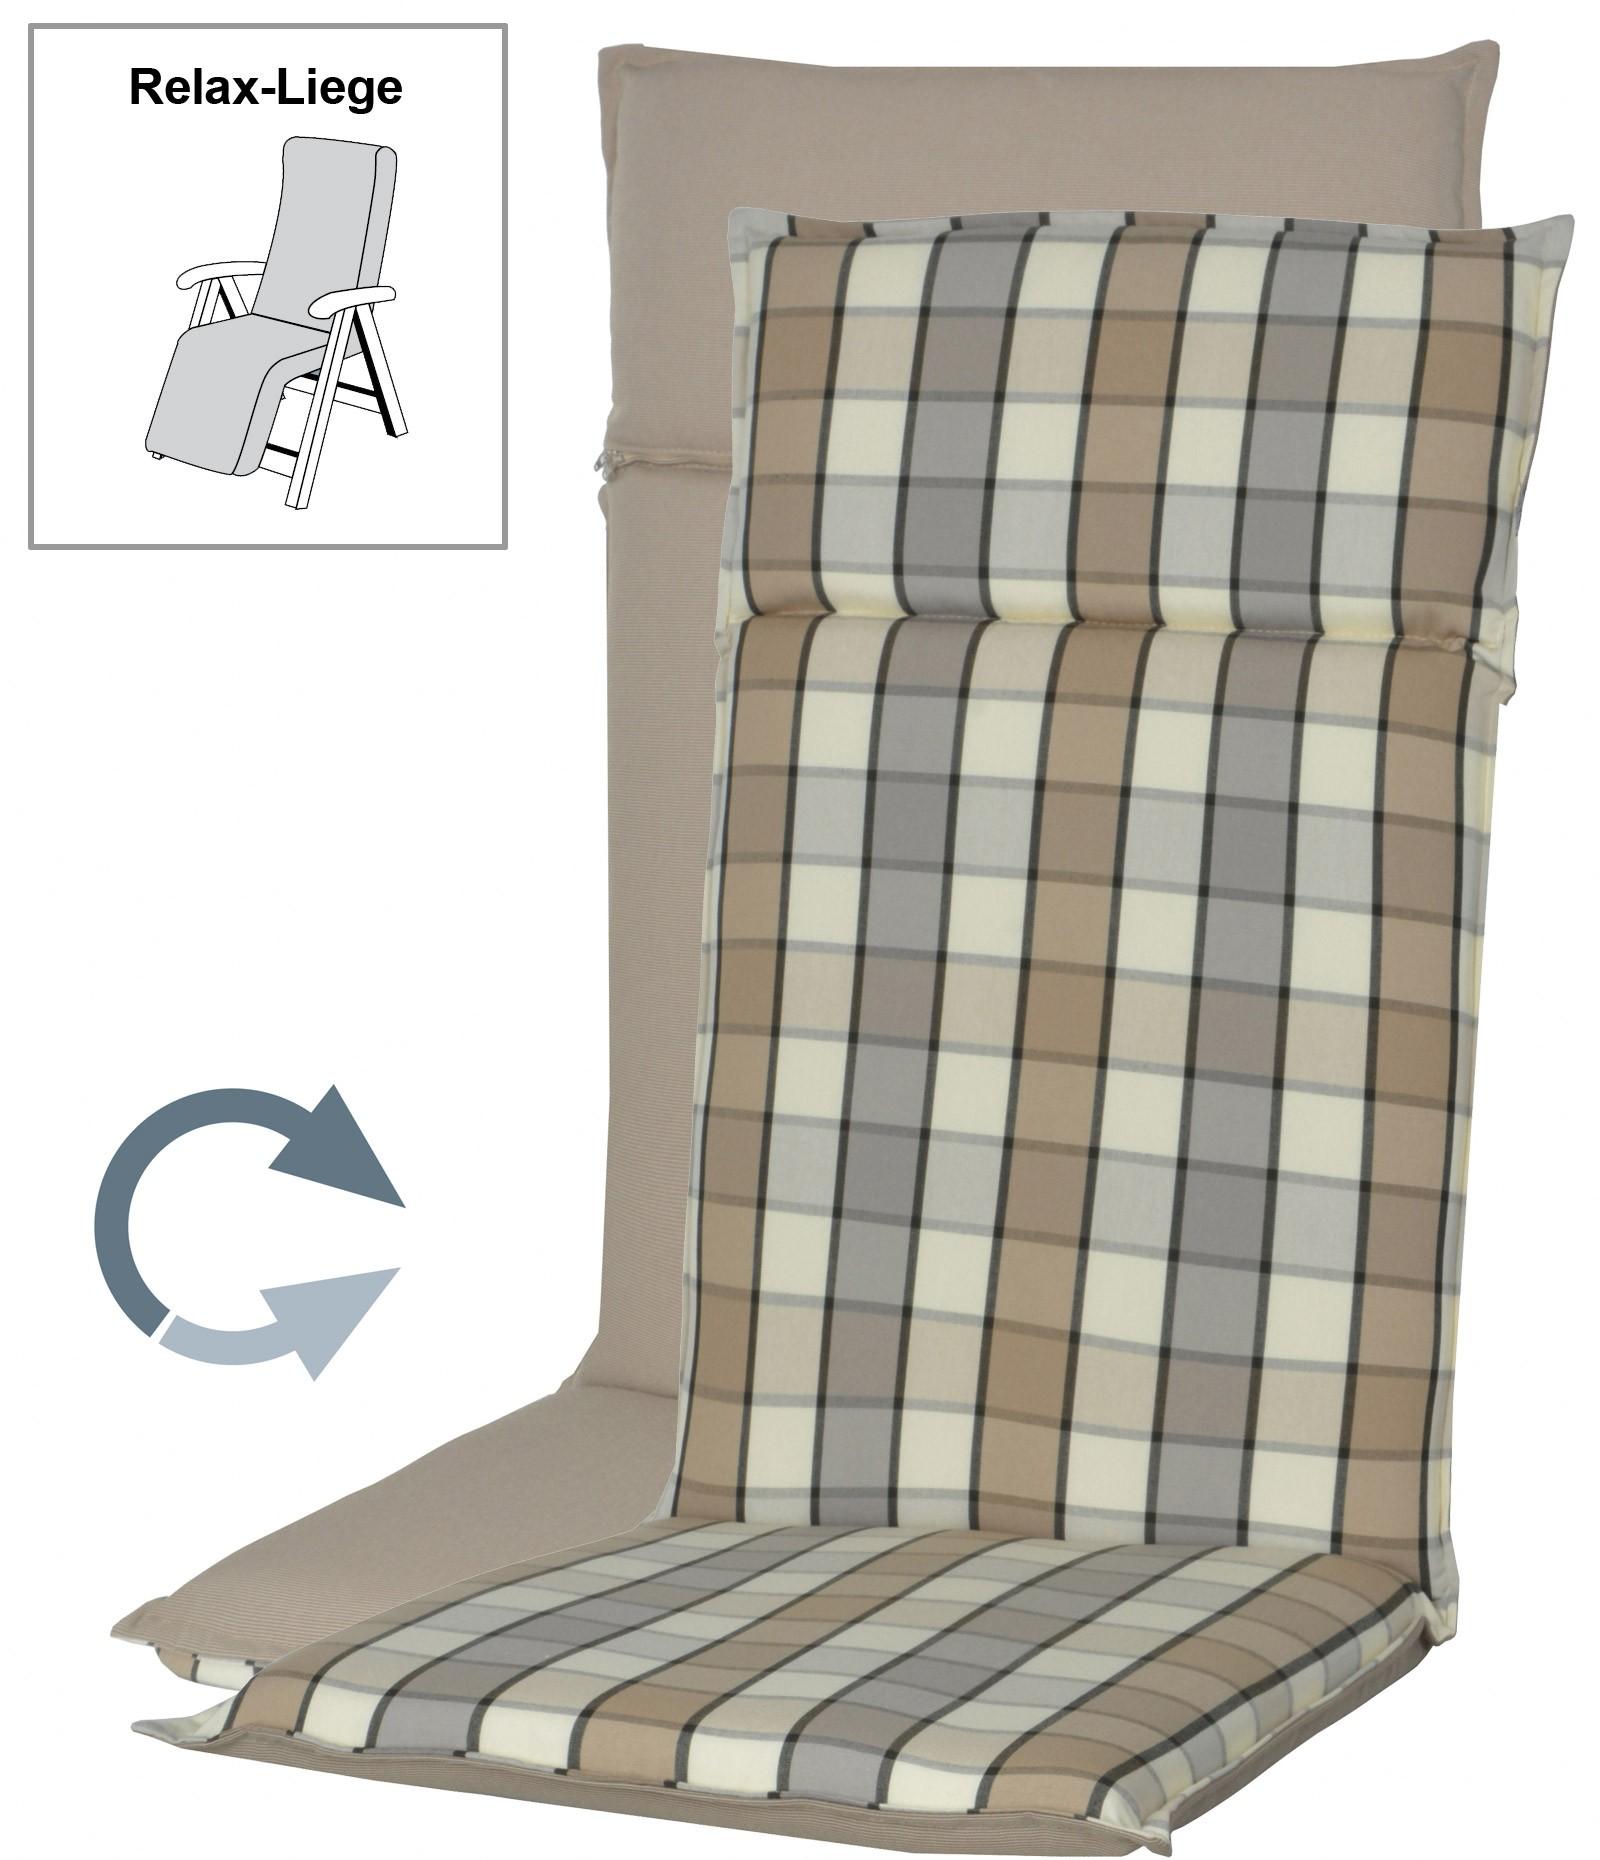 polster auflage f r gartenm bel relaxsessel fashion d. Black Bedroom Furniture Sets. Home Design Ideas